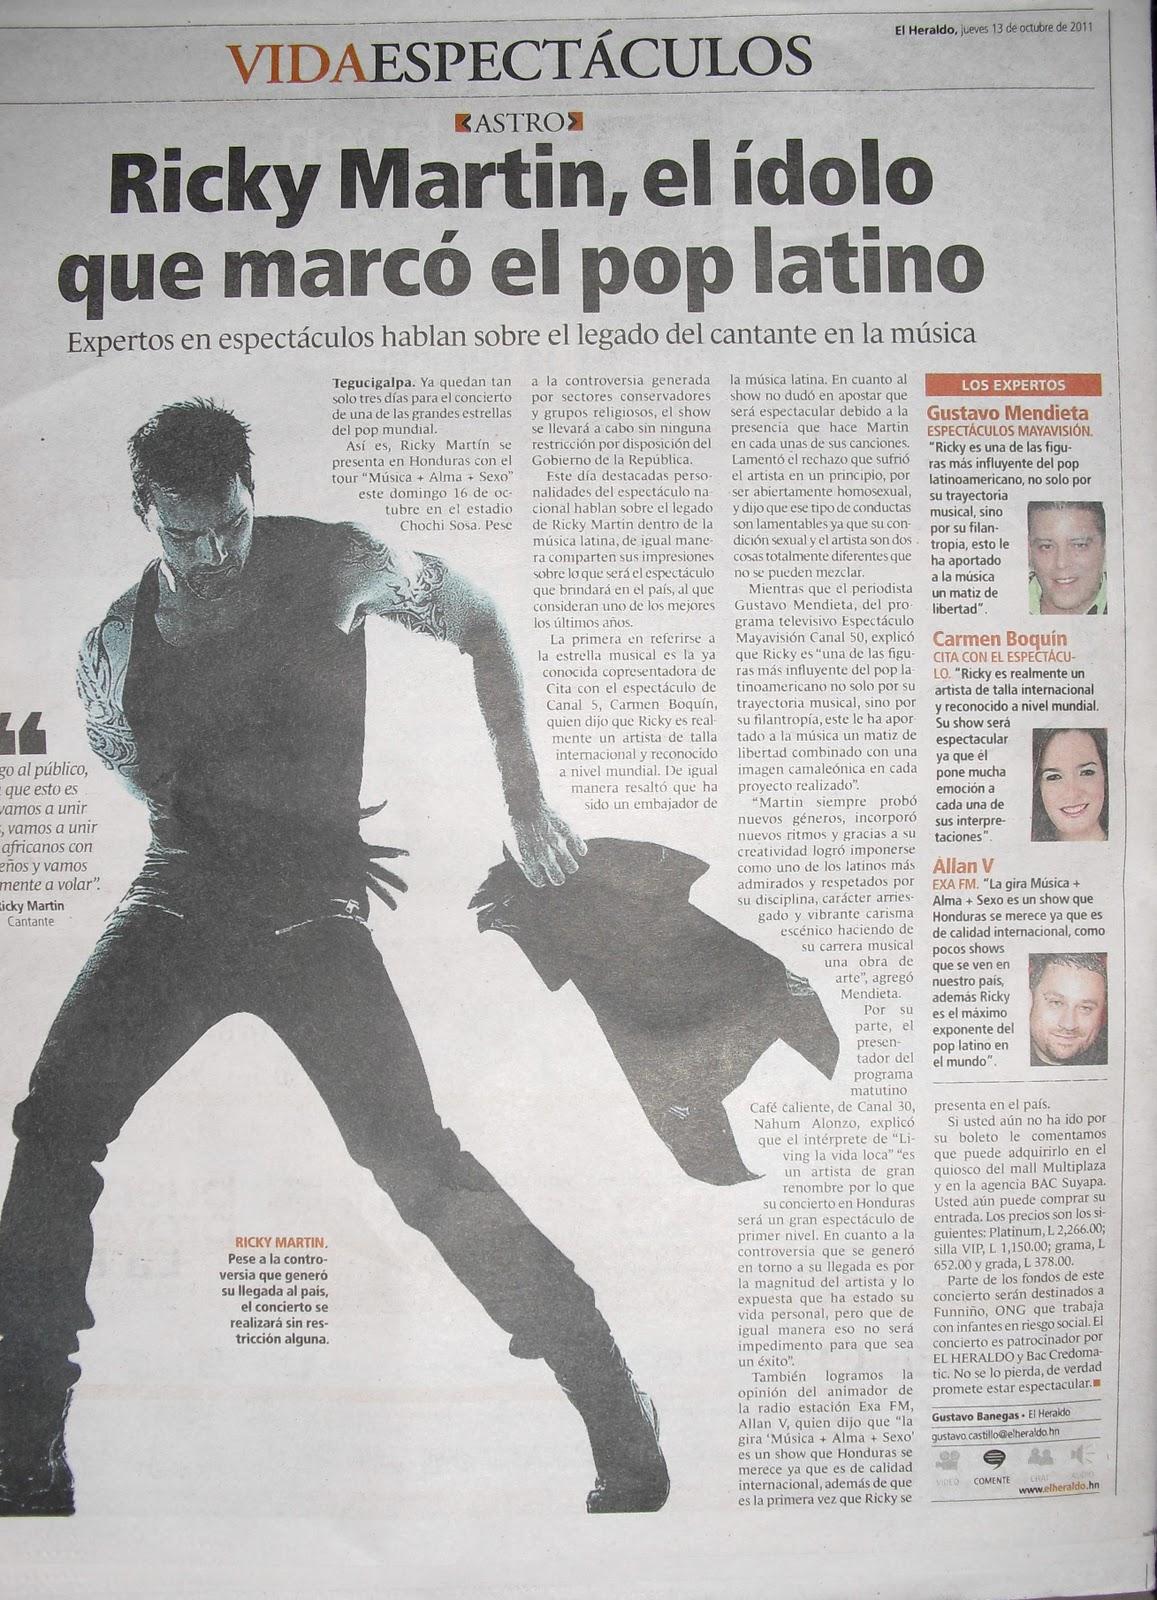 http://3.bp.blogspot.com/-q2W4sjbo1gk/TpeSFgg3-hI/AAAAAAAAB_c/42Scrq0azFo/s1600/Nota+El+Heraldo+Ricky+Martin.JPG